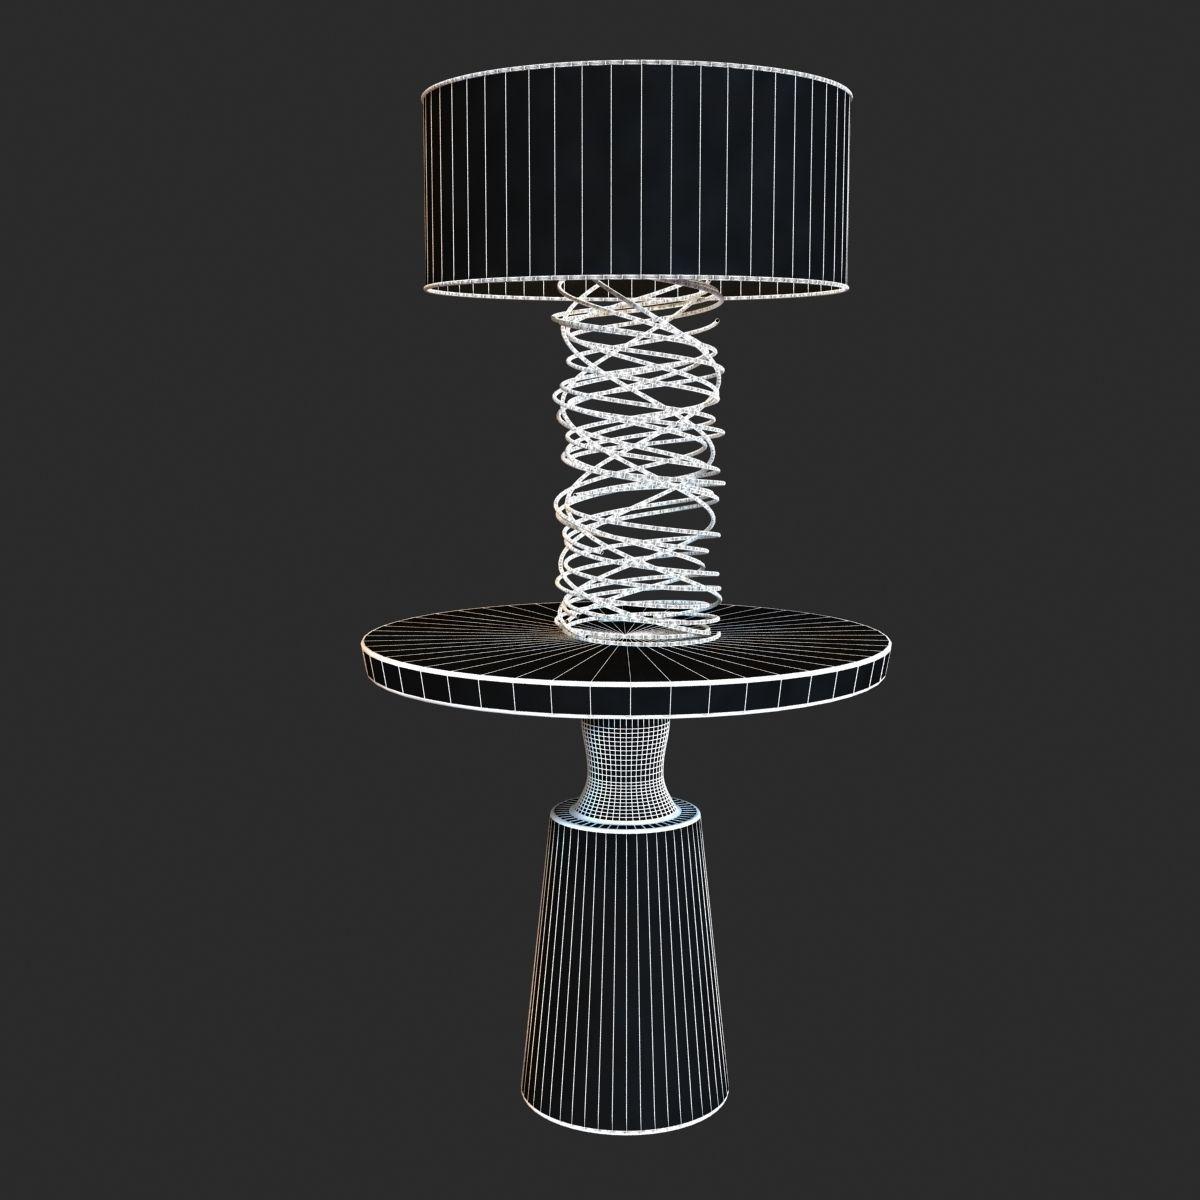 Charming ... Ralph Pucci Table Lighting Tornado Lamp 3d Model Max Obj 3ds Fbx Mtl 7  ... Design Ideas